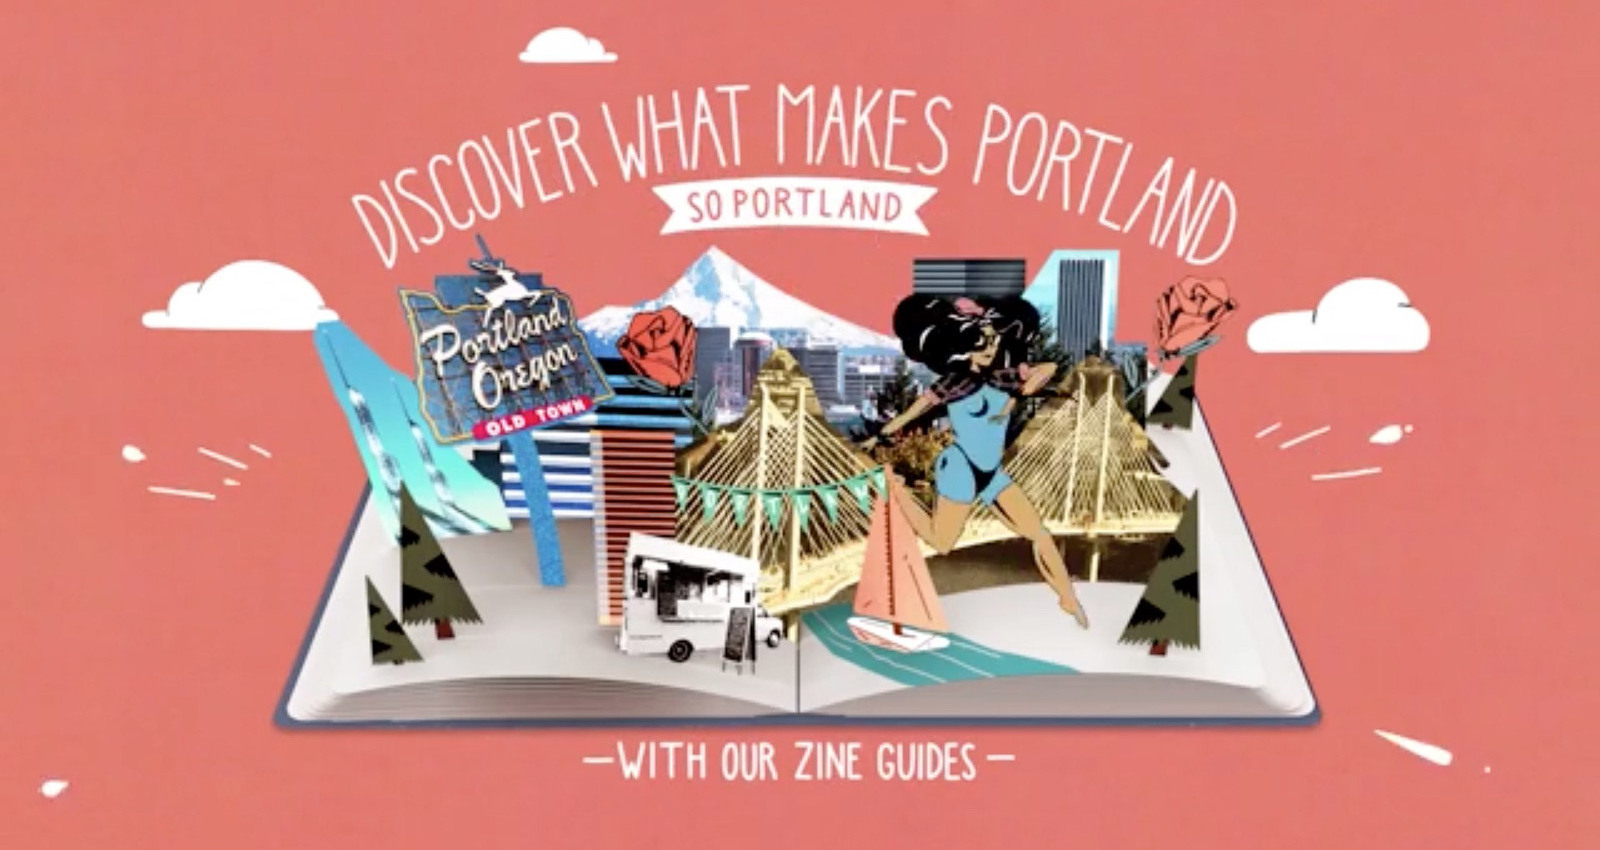 Discover What Makes Portland So Portland